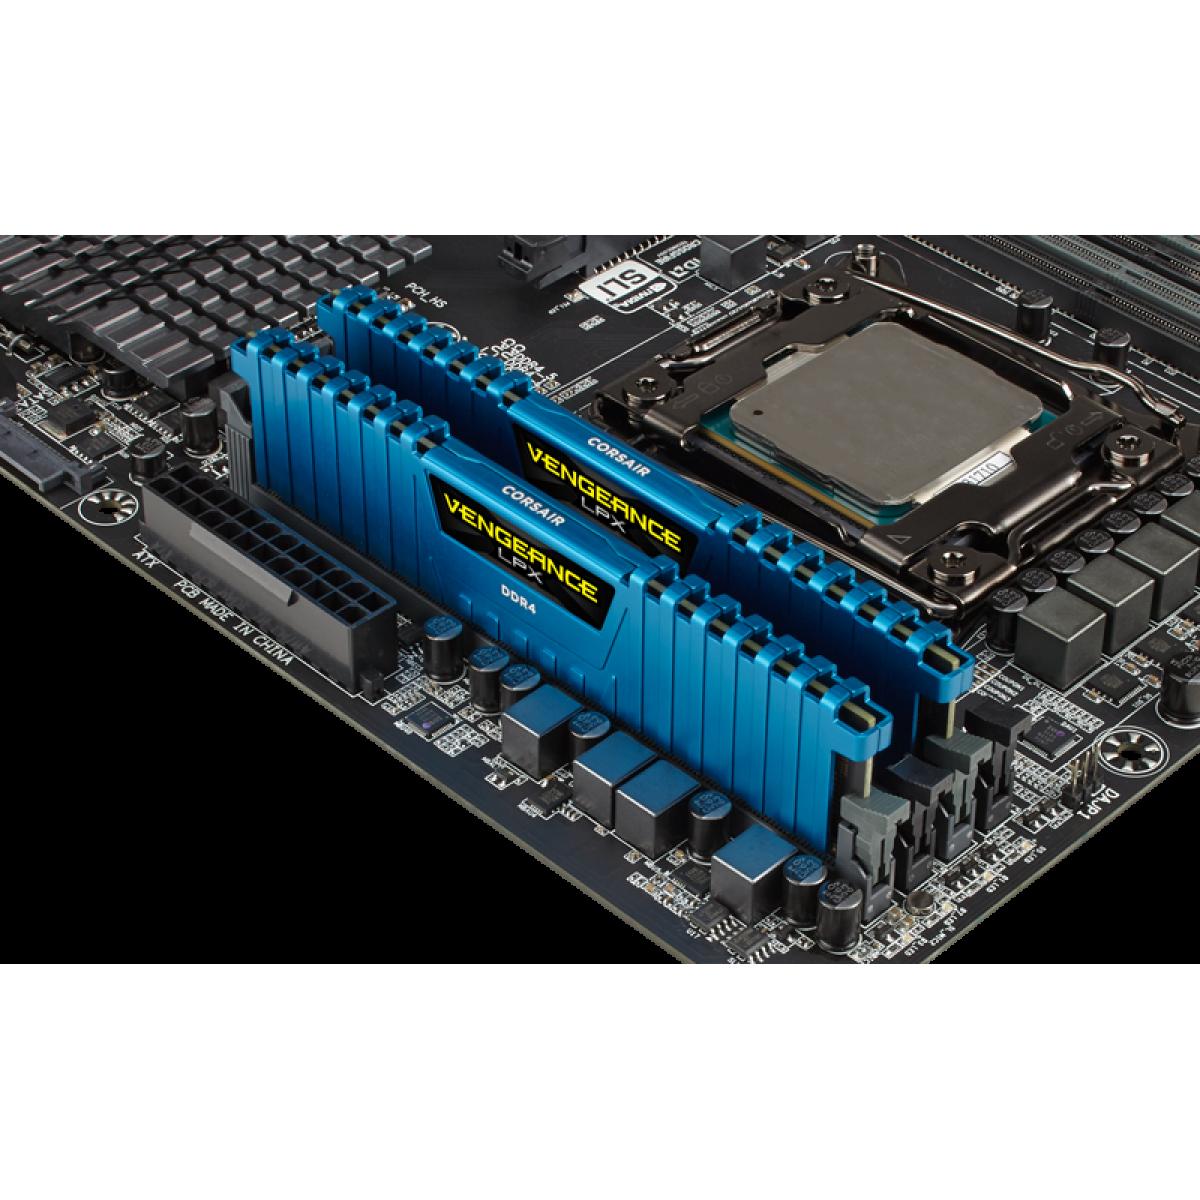 Memória DDR4 Corsair Vengeance LPX, 16GB (2x8GB) 3000MHz, Blue, CMK16GX4M2B3000C15B